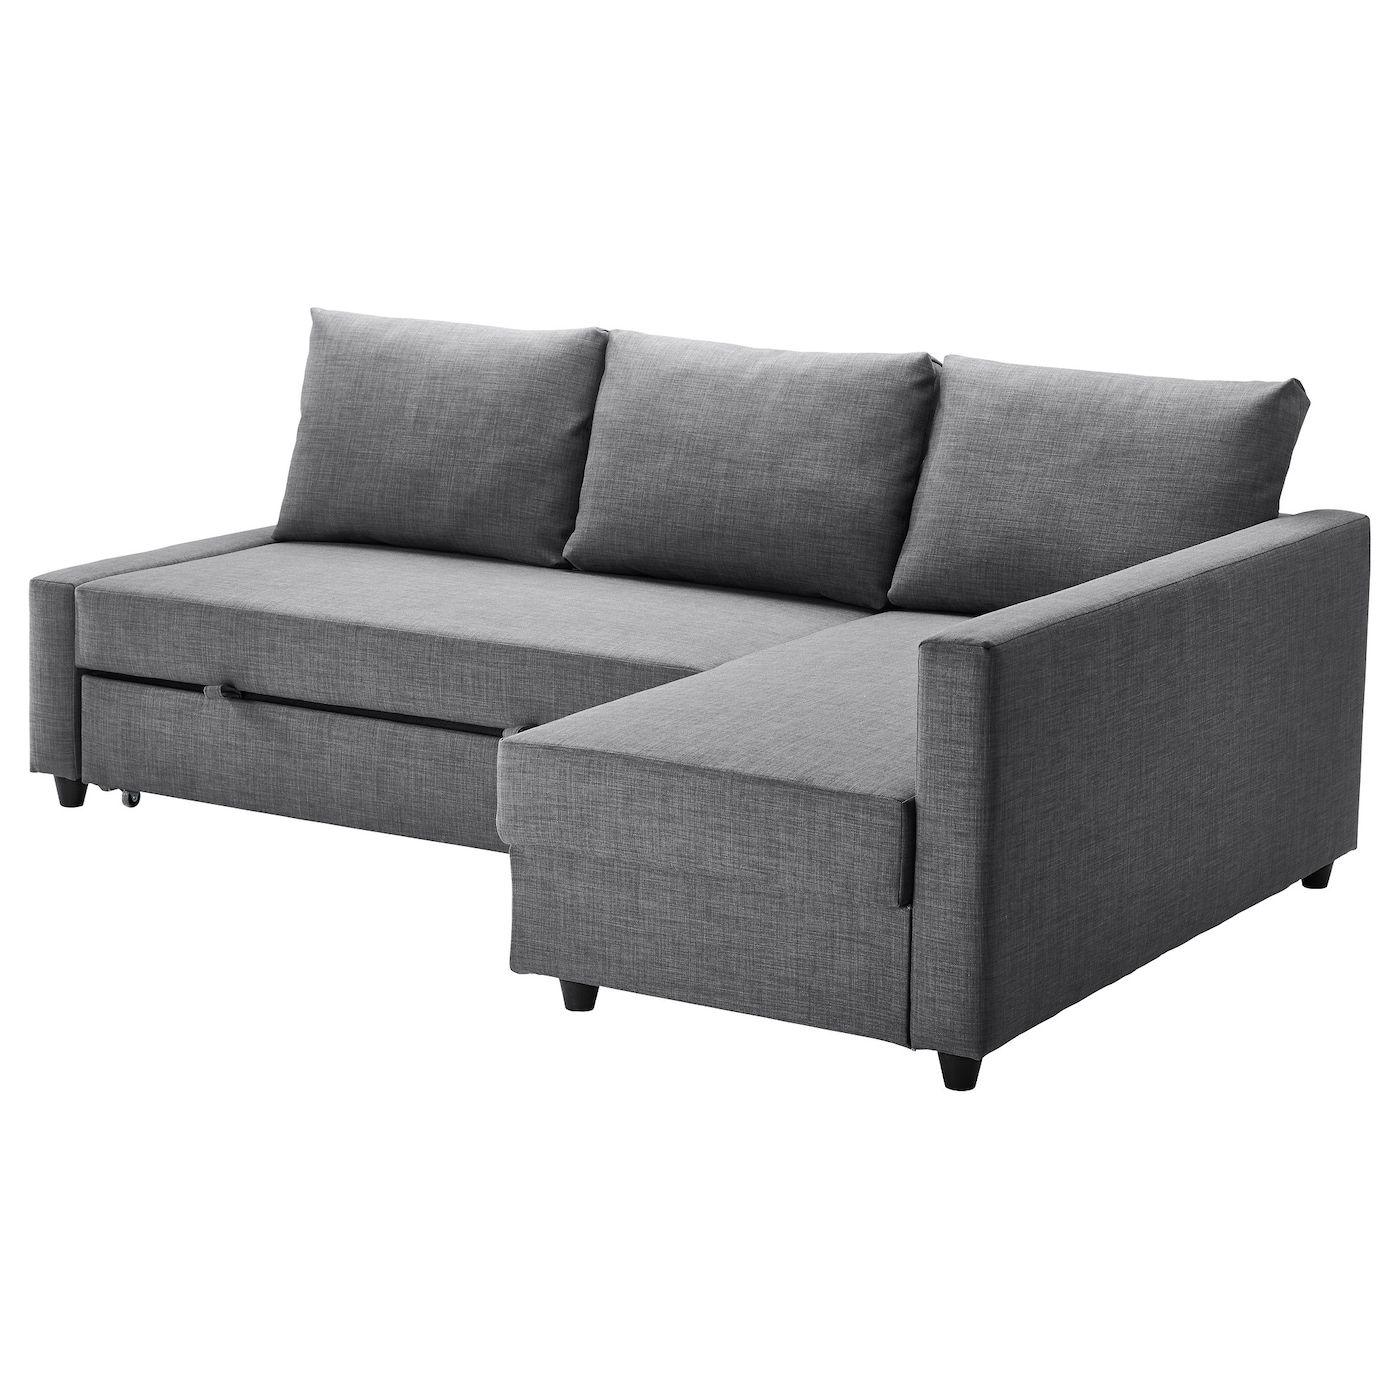 Friheten Sleeper Sectional 3 Seat W Storage Skiftebo Dark Gray Ikea In 2020 Sofa Bed With Storage Sofa Bed With Chaise Corner Sofa Bed With Storage